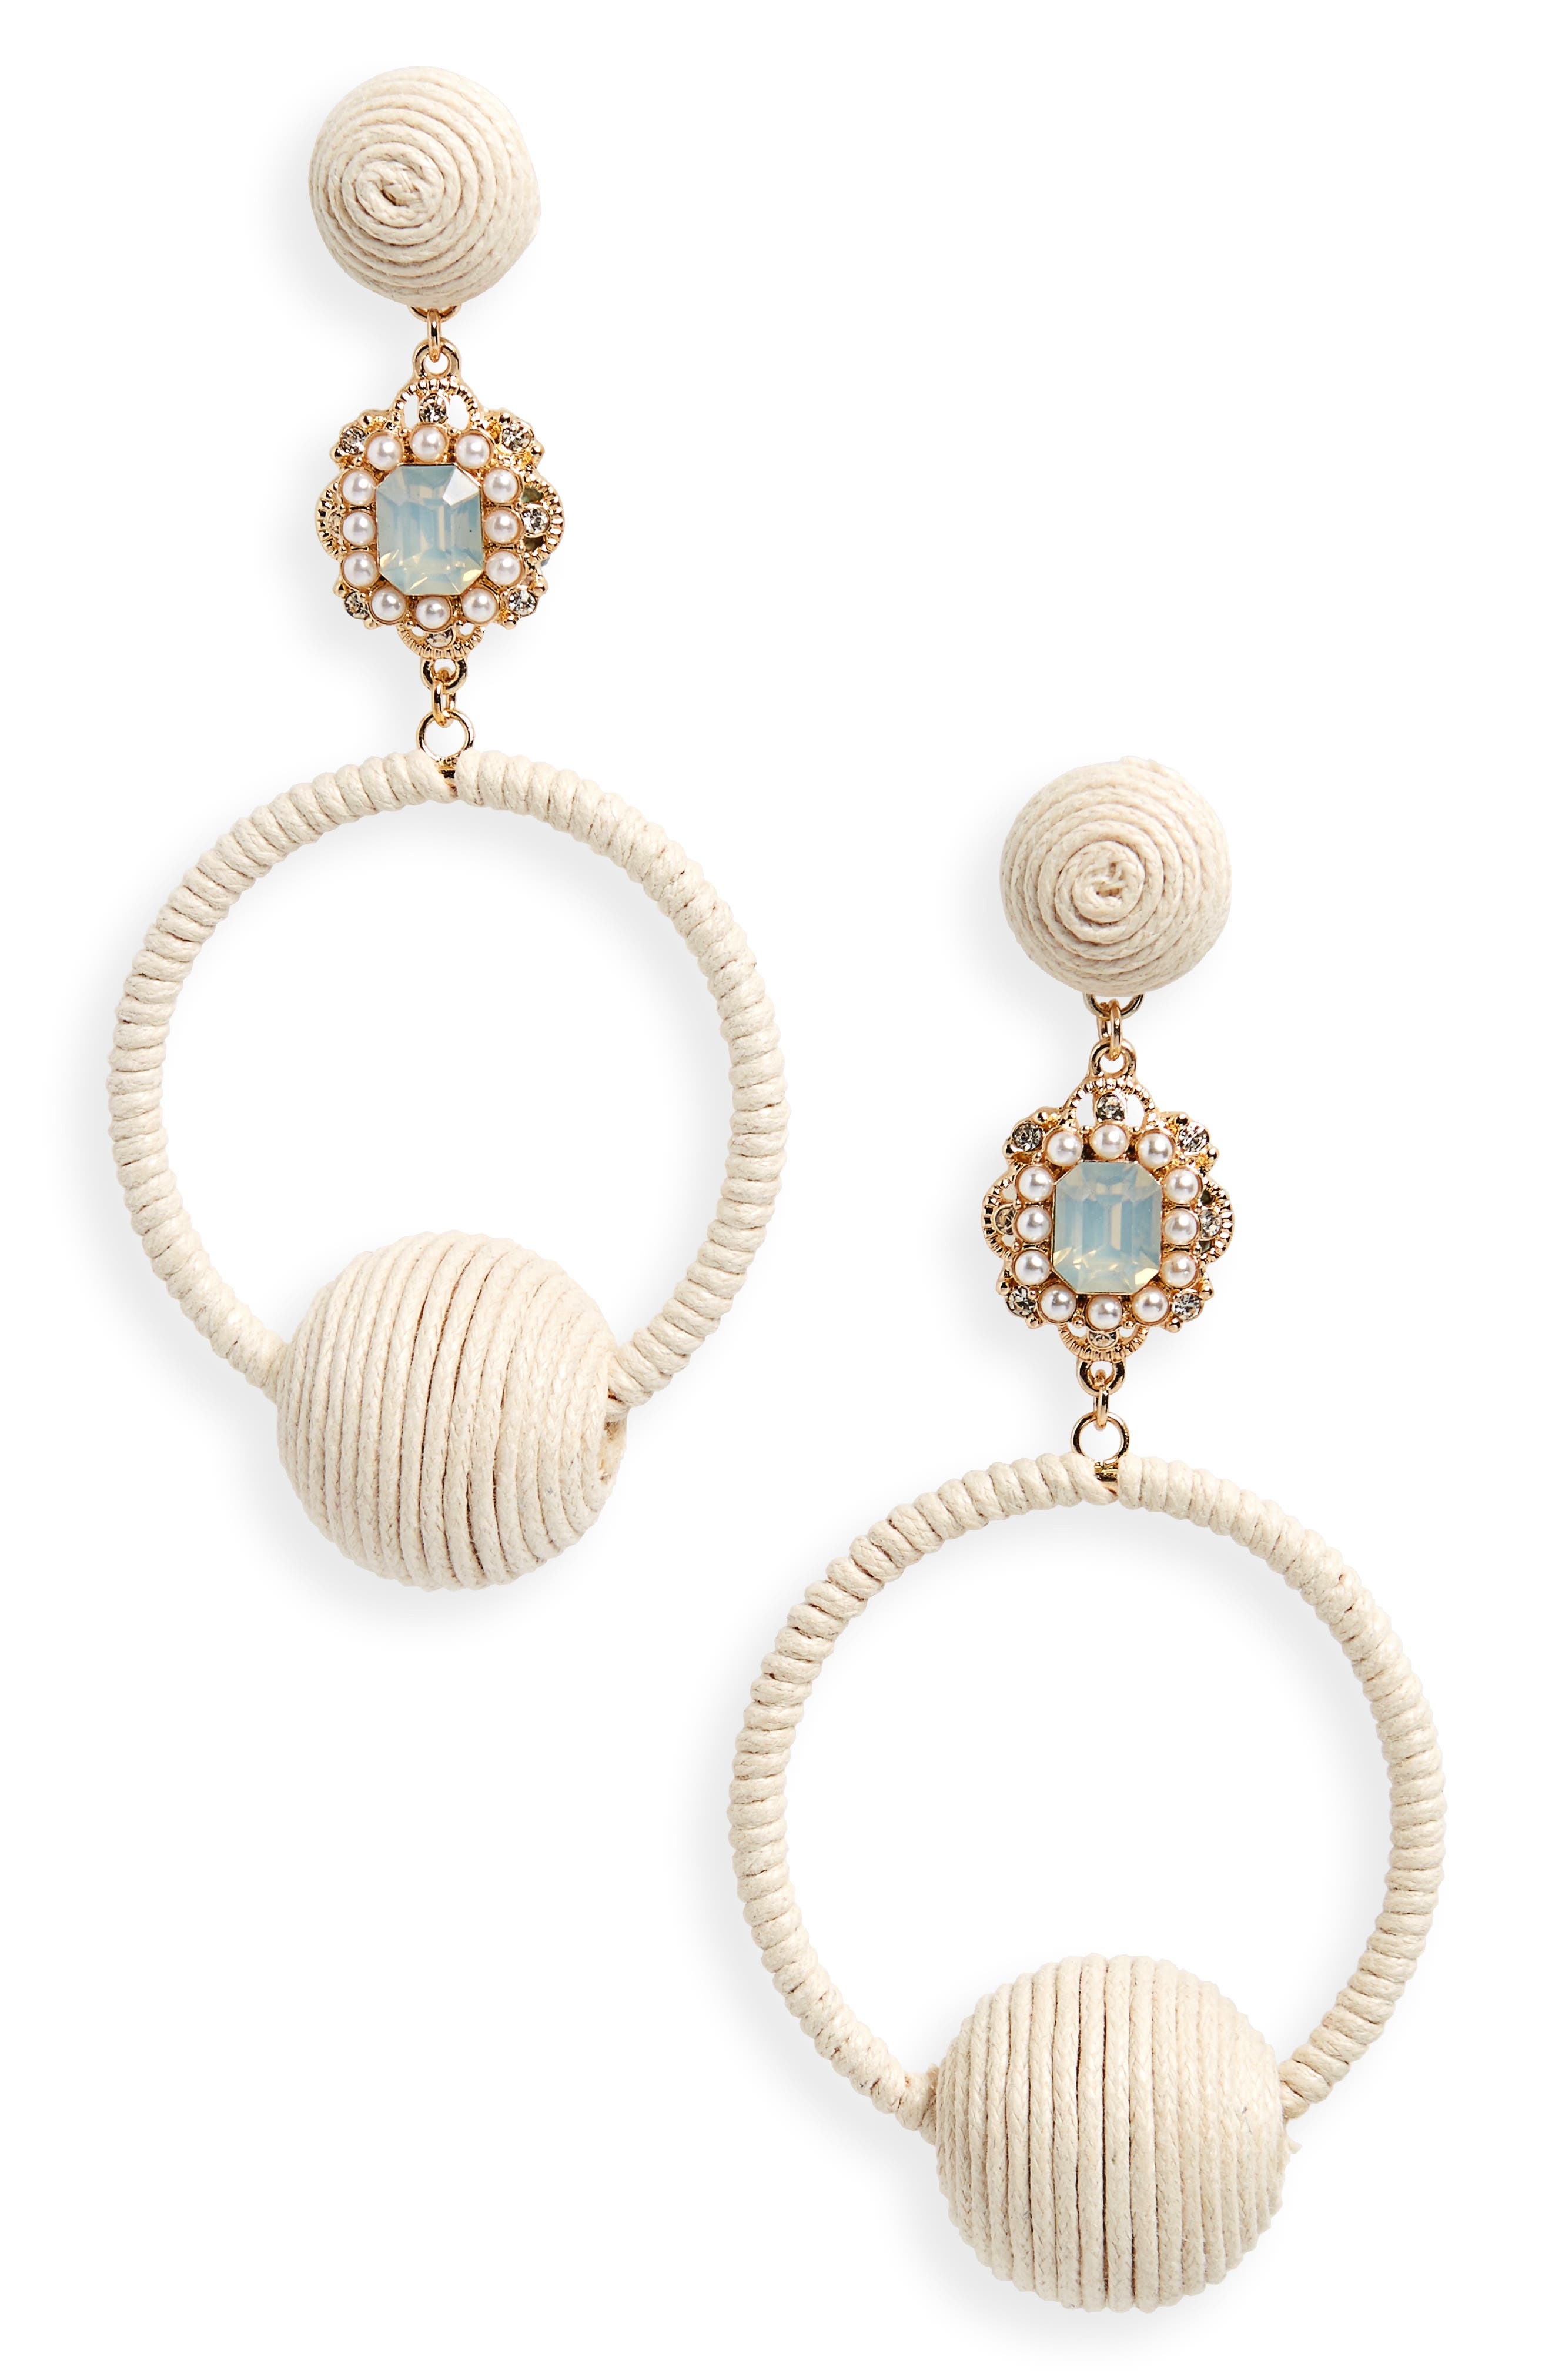 String Wrapped Crystal Hoop Earrings,                             Main thumbnail 1, color,                             710